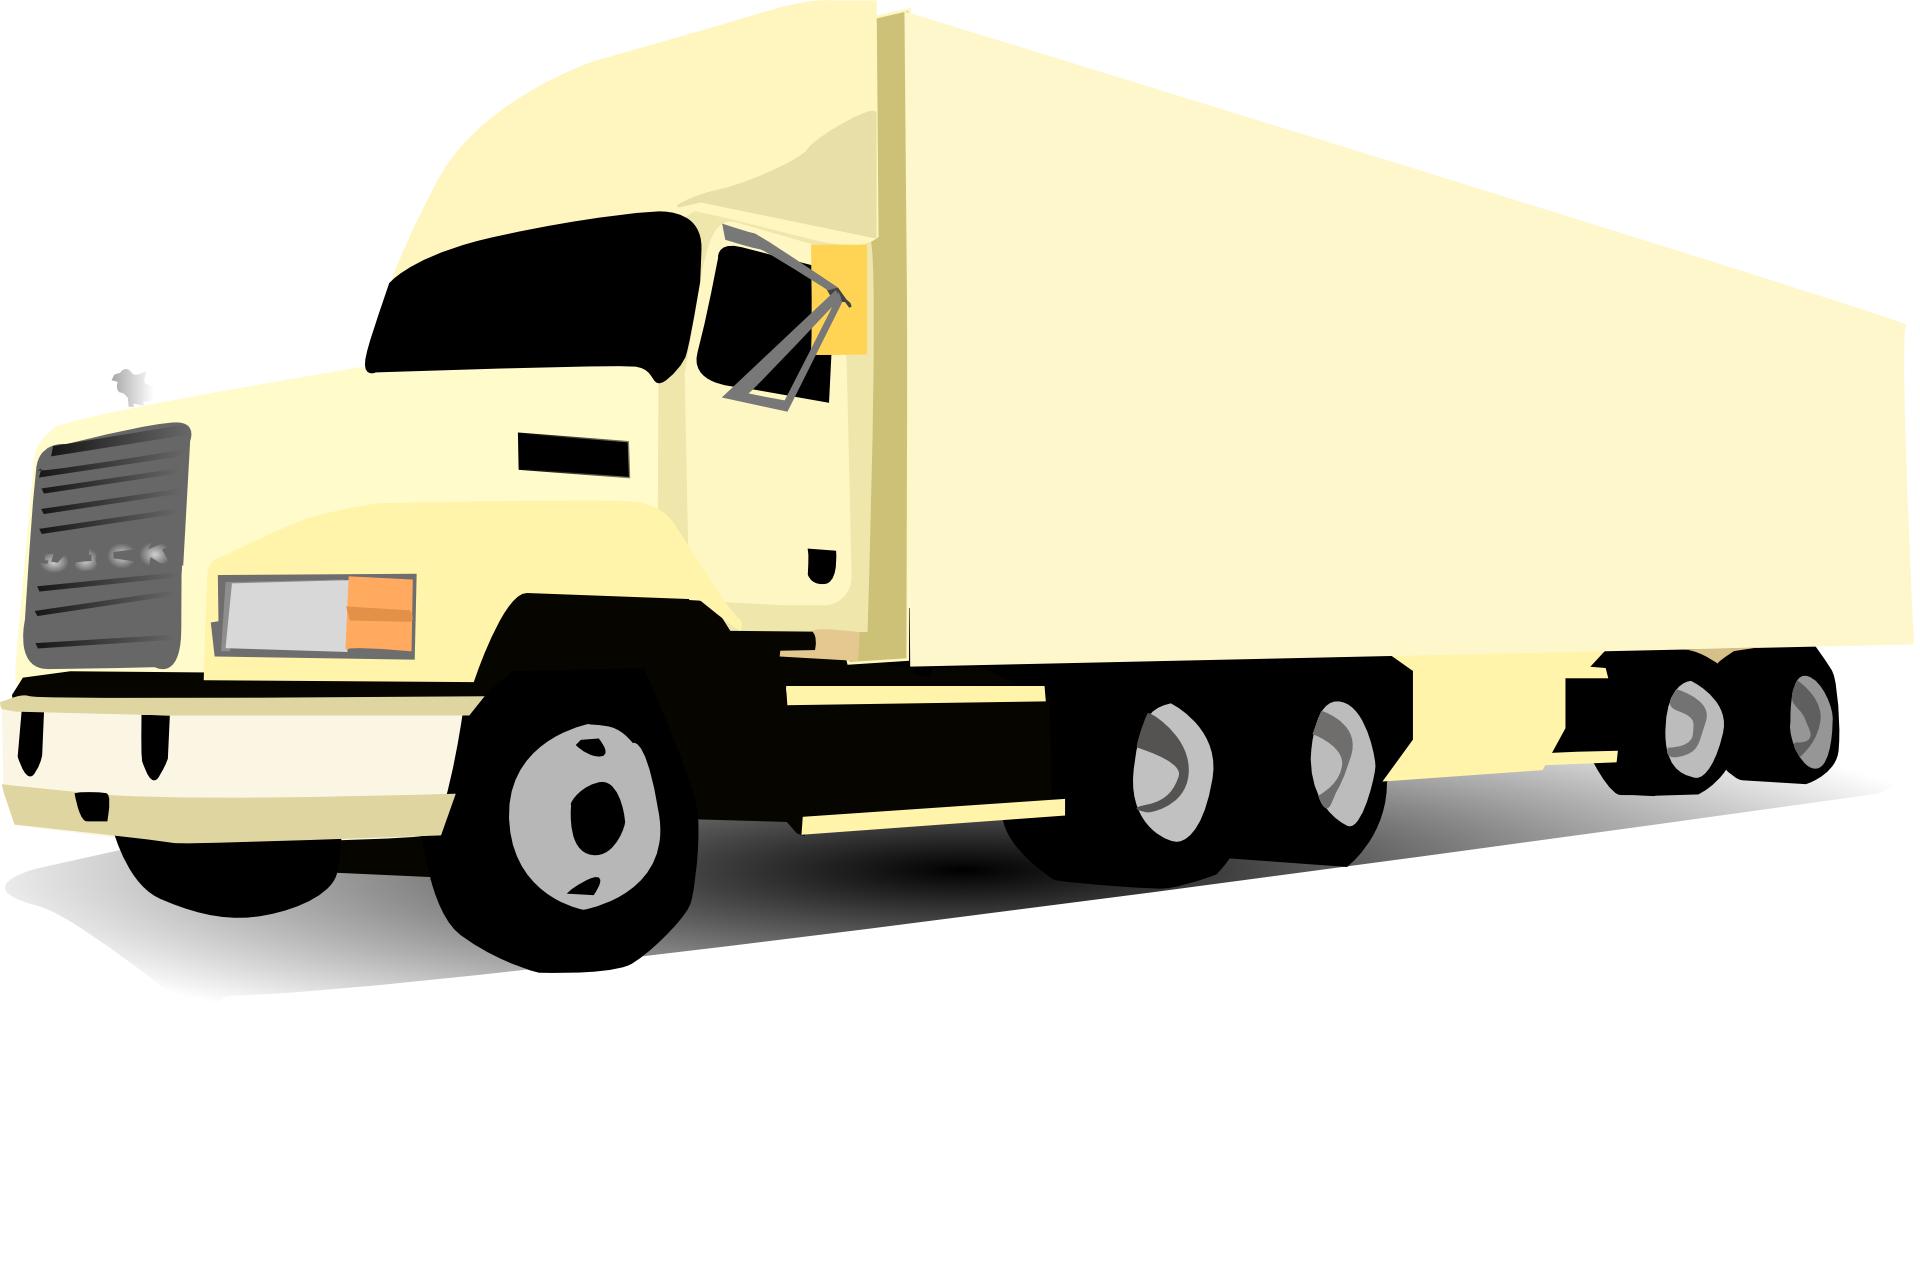 Cartoon vehicle, truck lorry vector